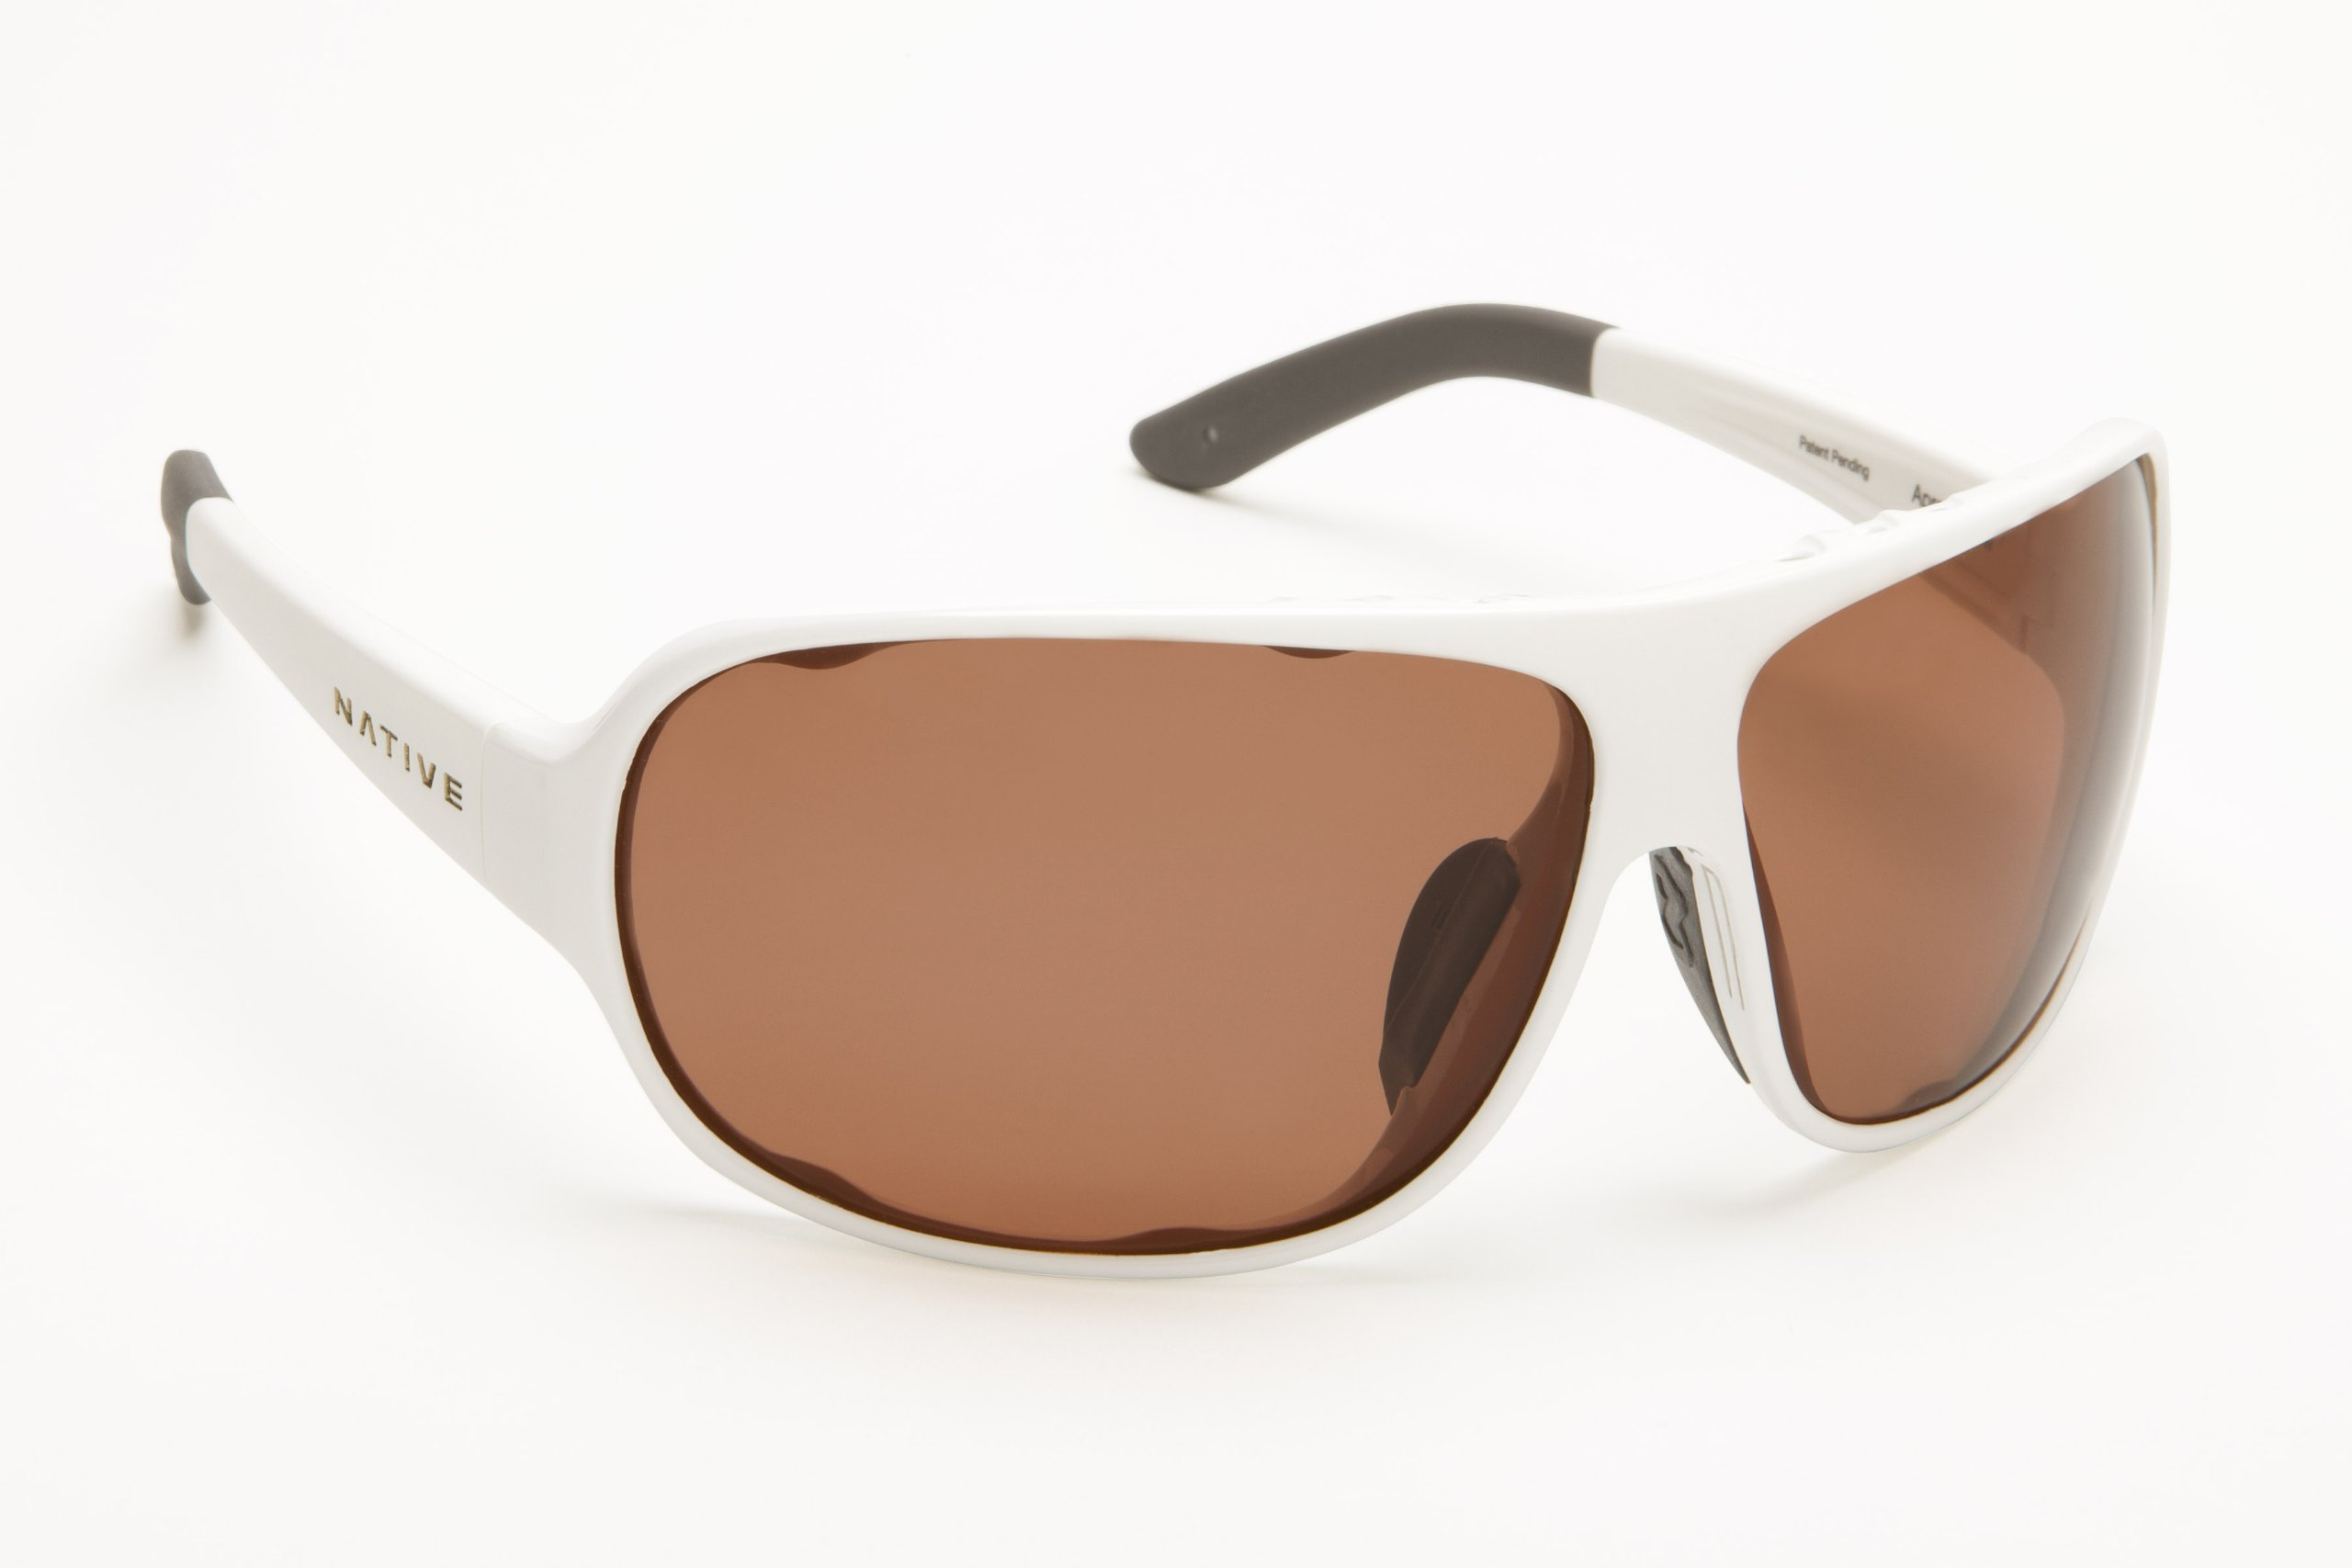 Native Eyewear Apres Sunglasses (Snow, Copper)